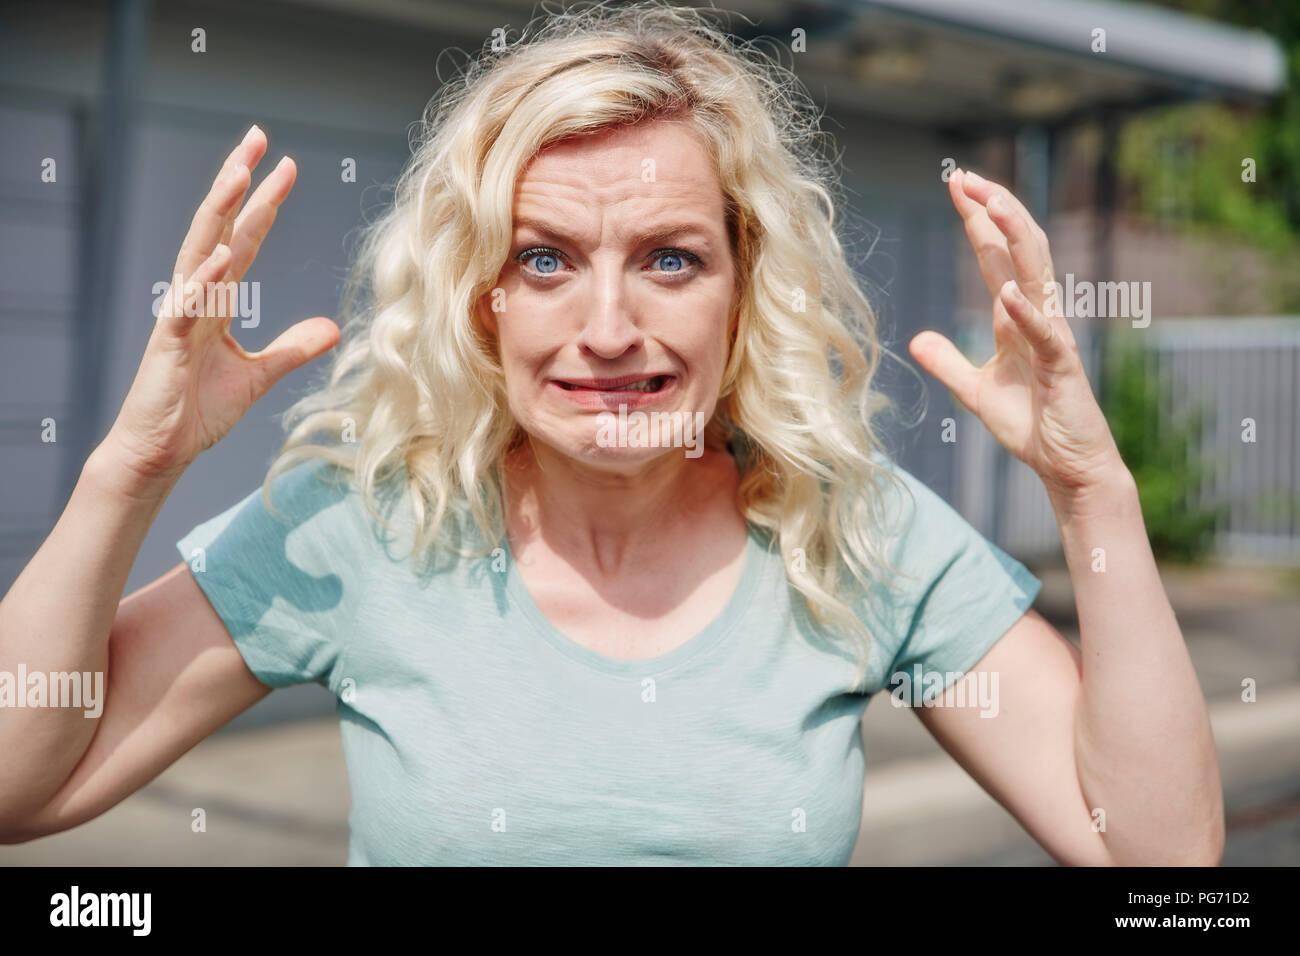 Portrait of grimacing woman outdoors - Stock Image